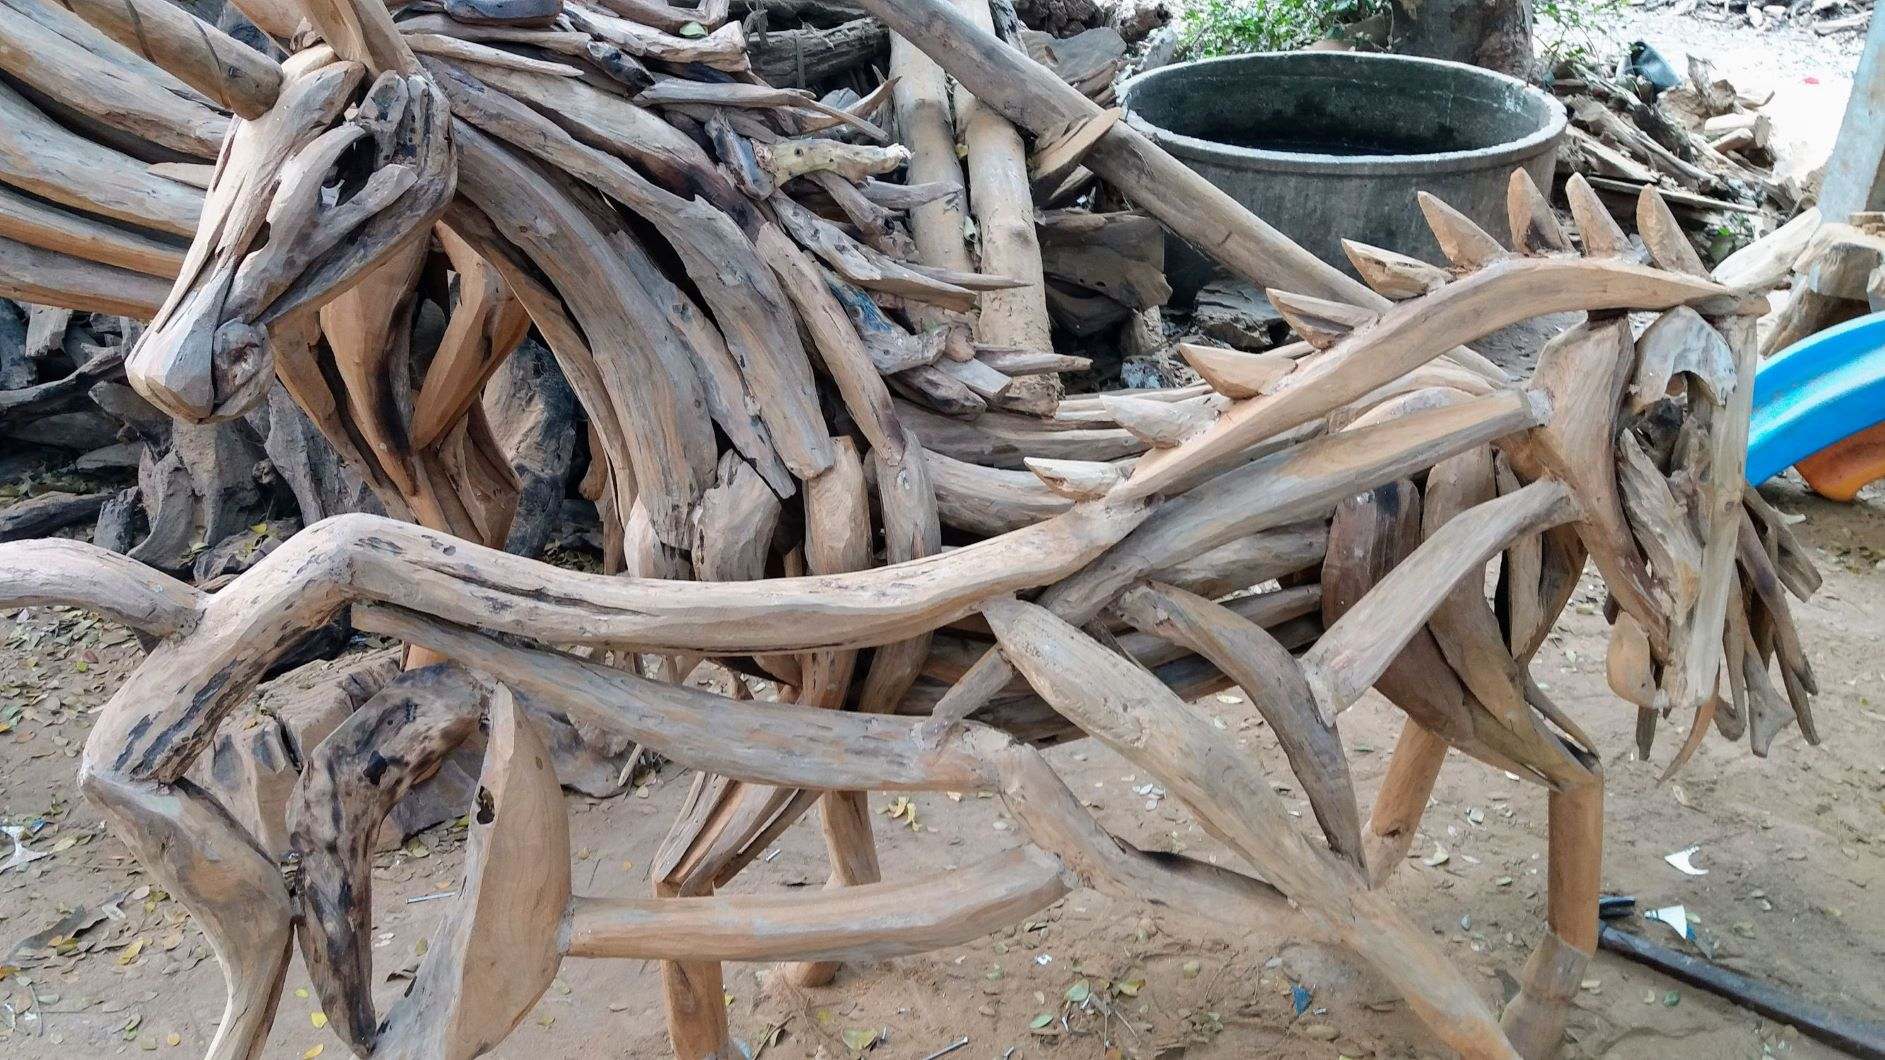 DriftwoodHorse916